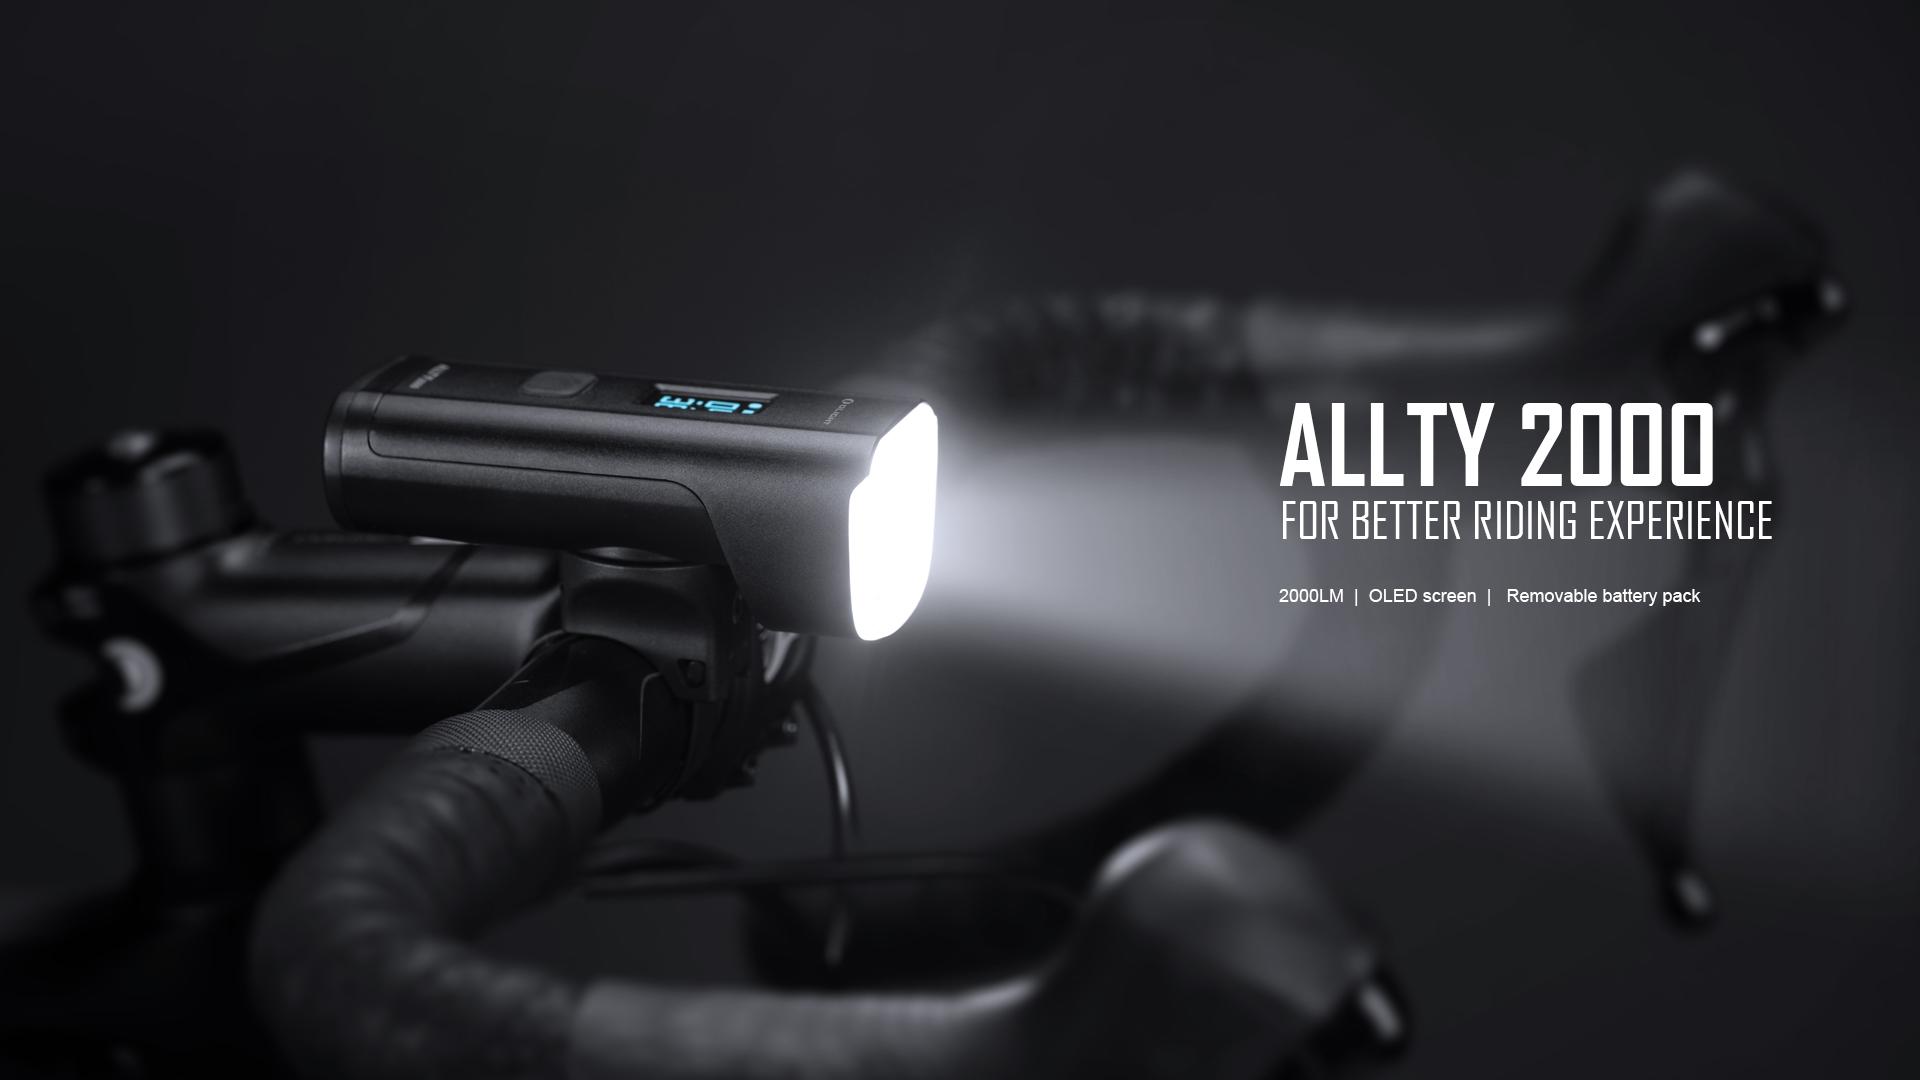 LLTY 2000 rechargeable front bike light